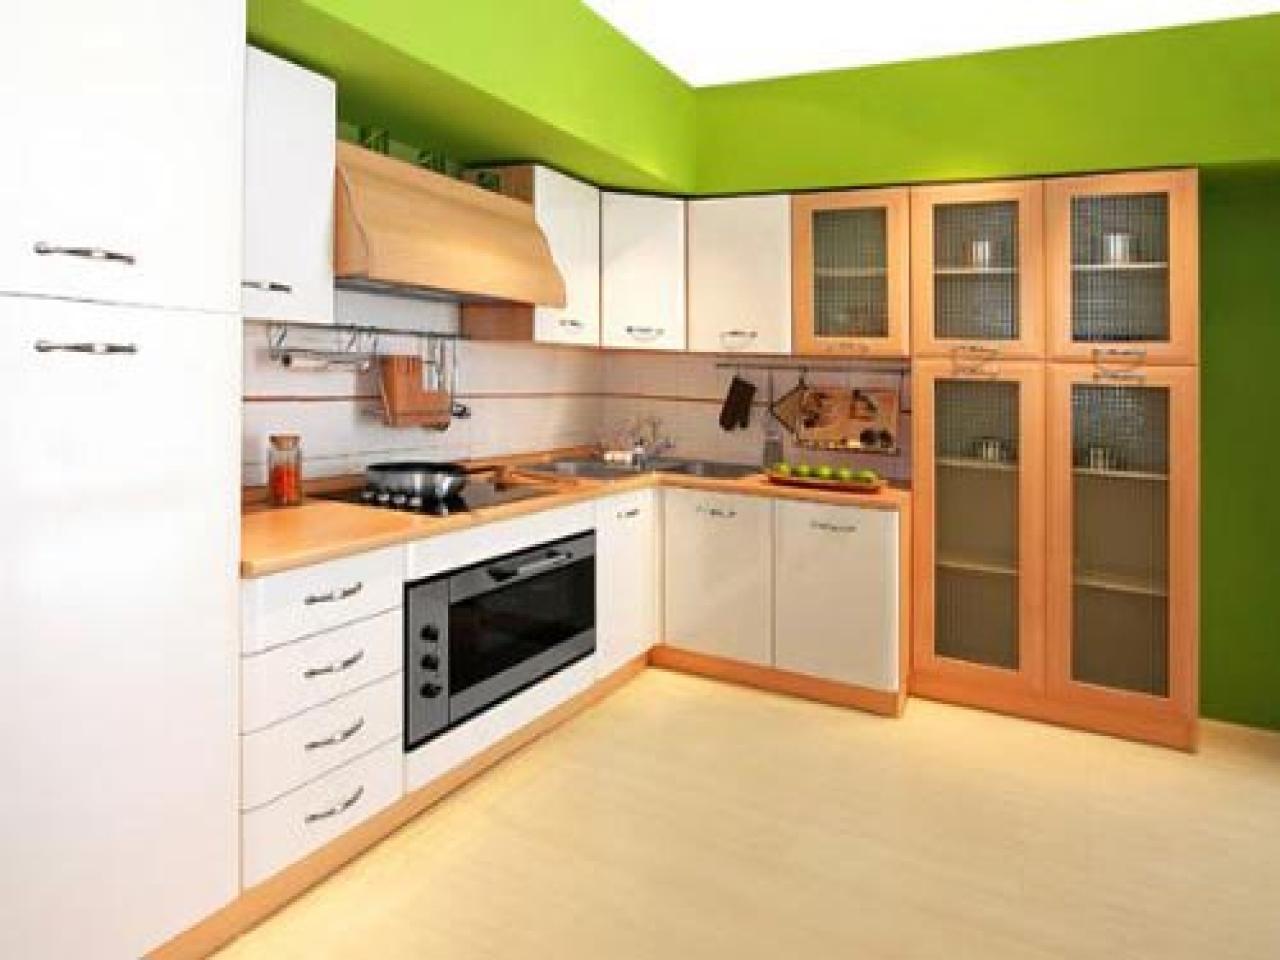 Lime Green Kitchen Walls Acnn Decor